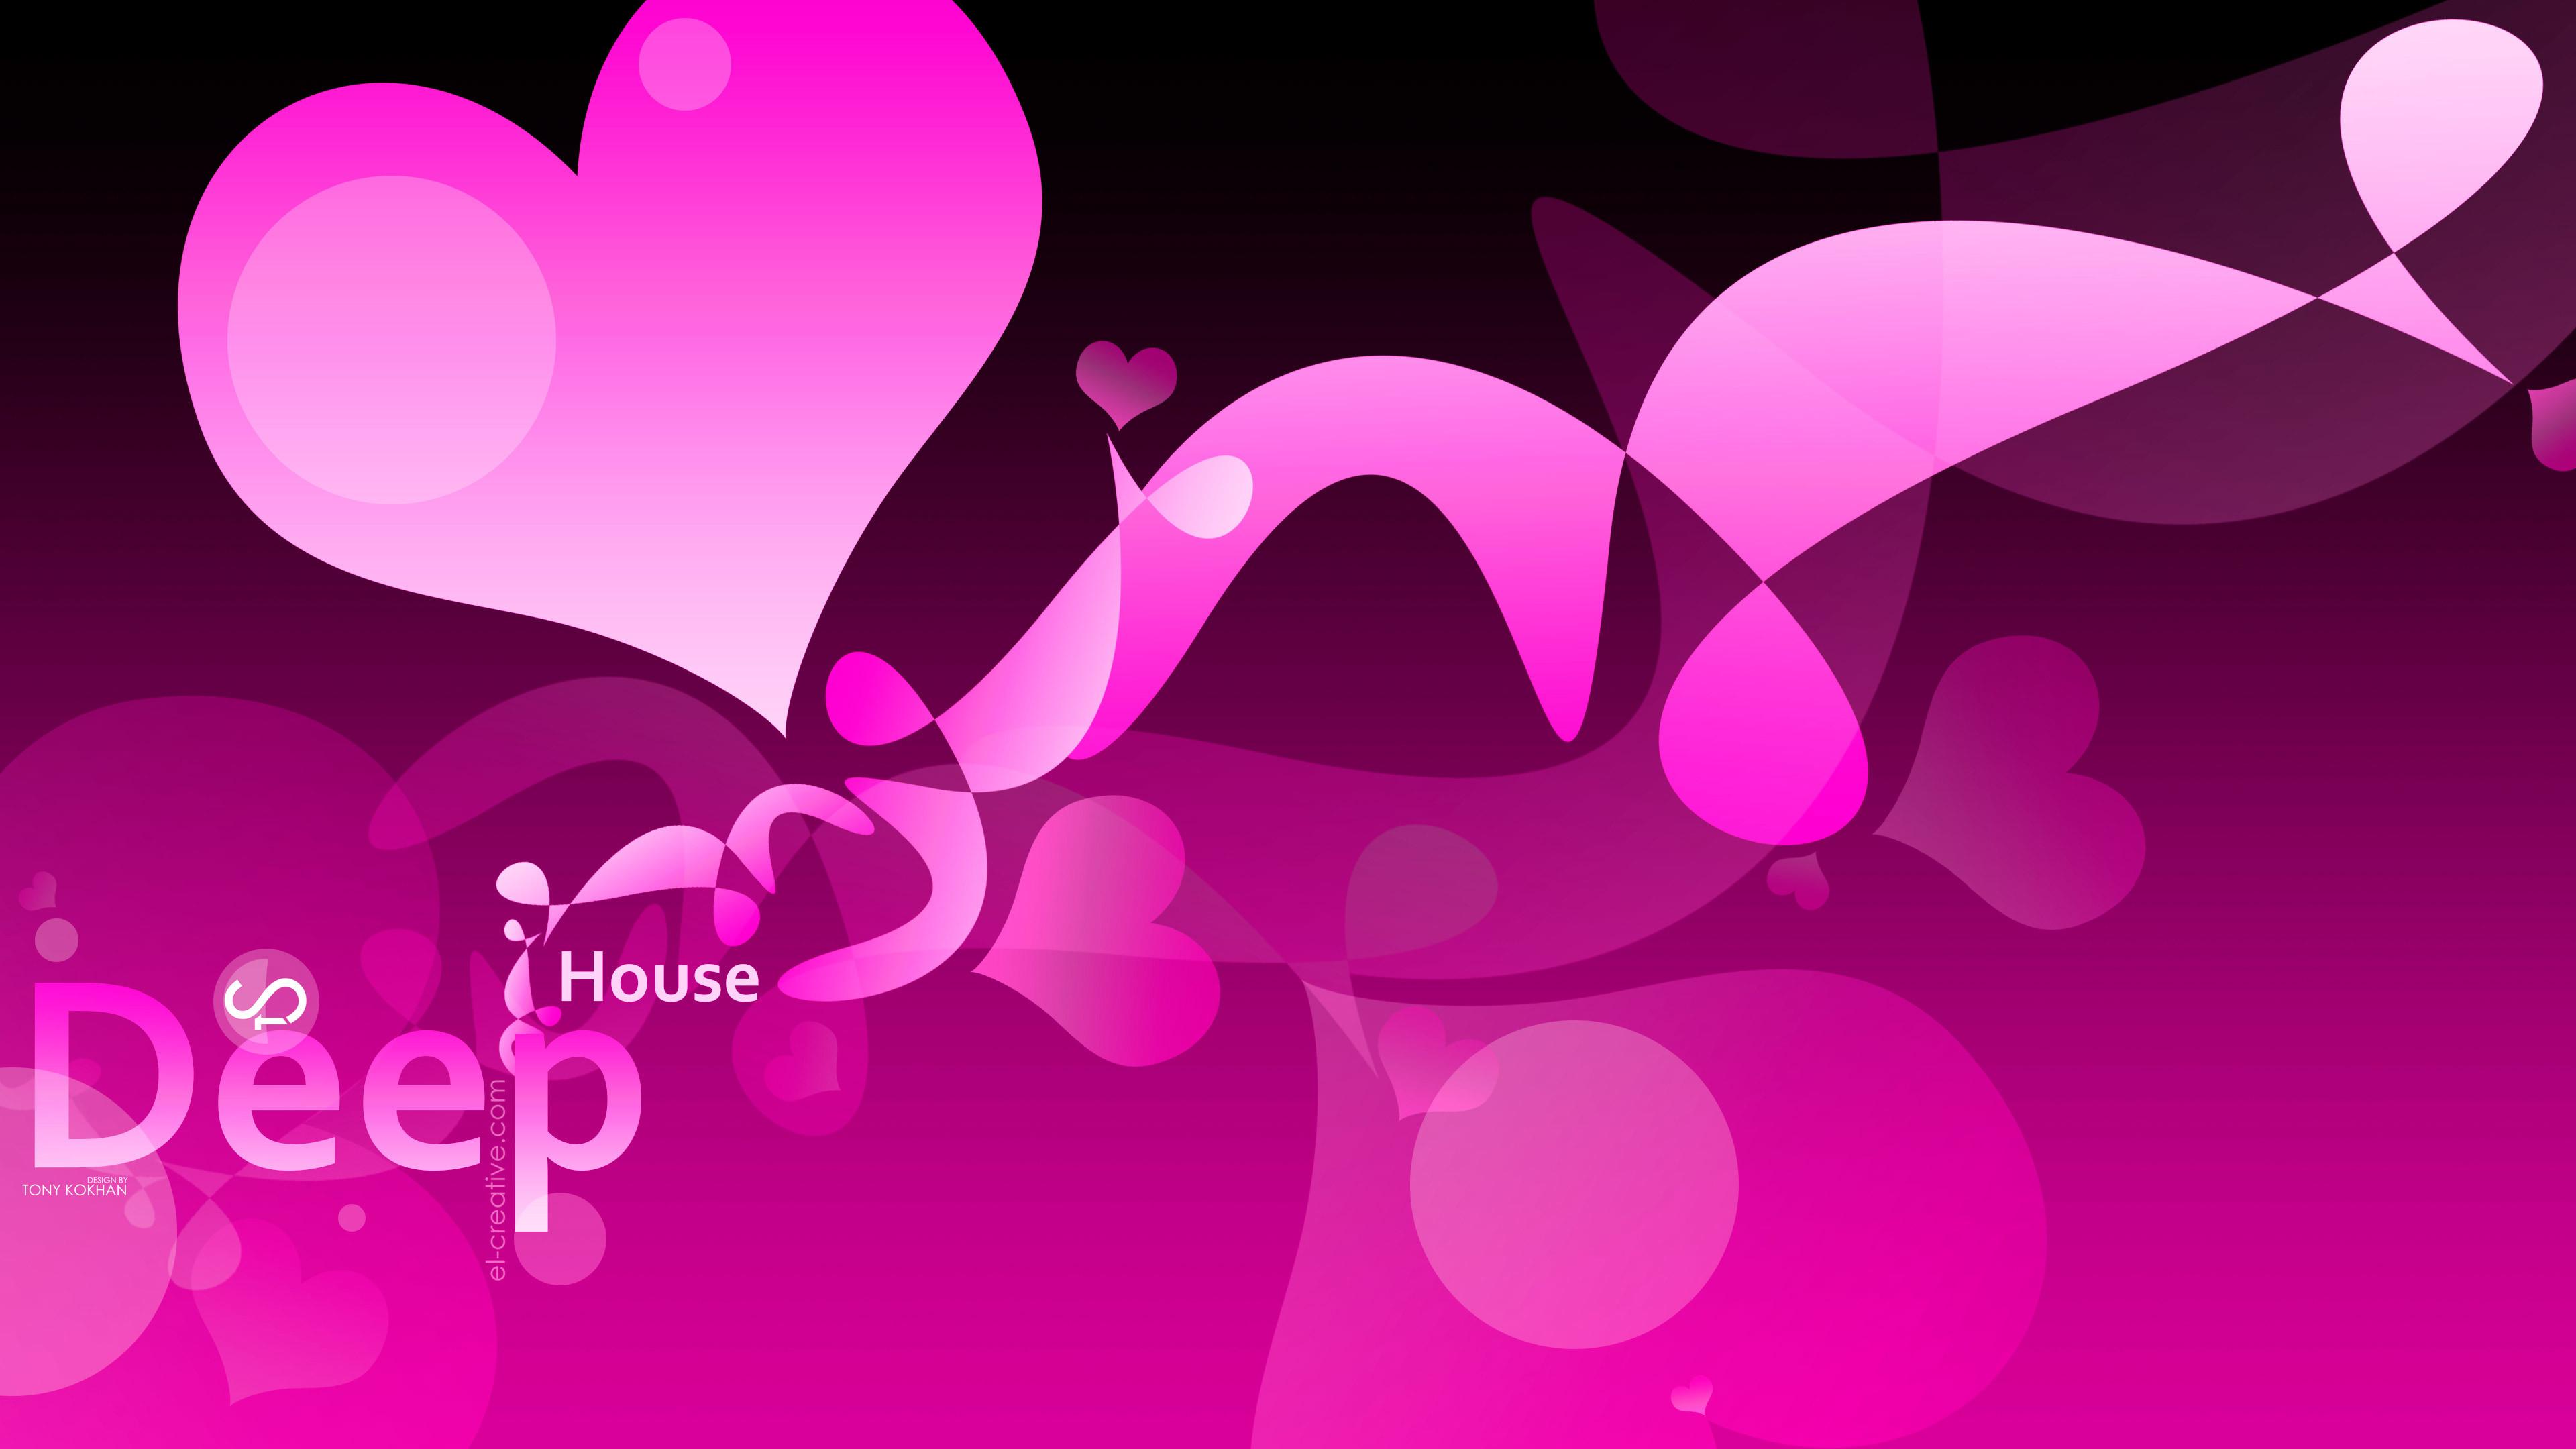 Deep House Music Abstract DJ Words